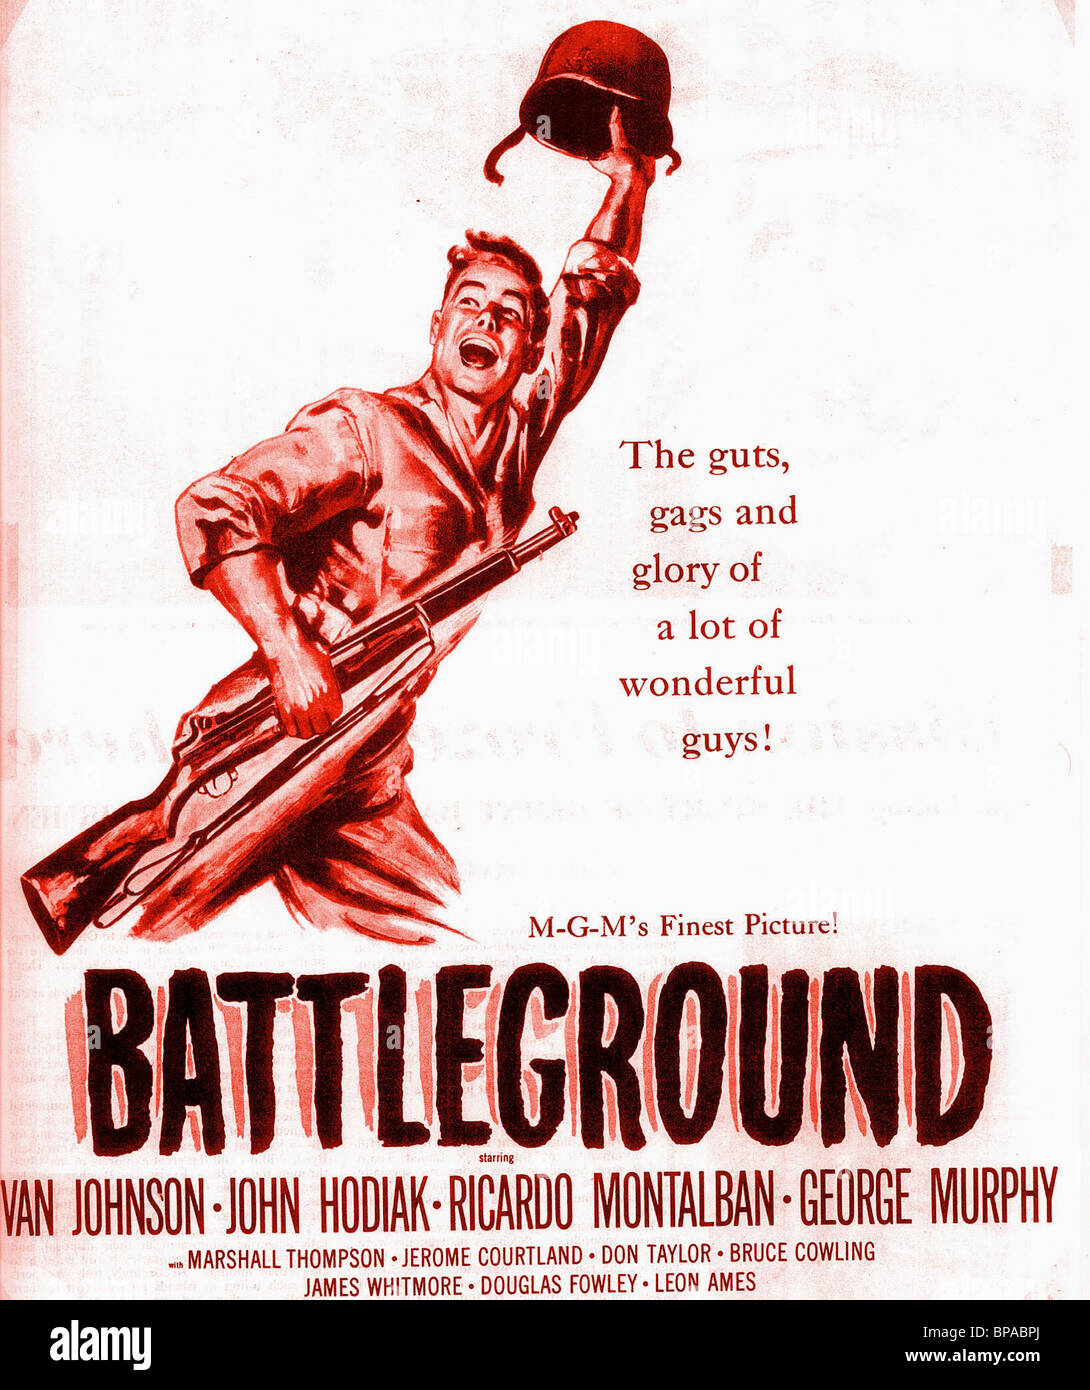 FILM POSTER BATTLEGROUND (1949) - Stock Image